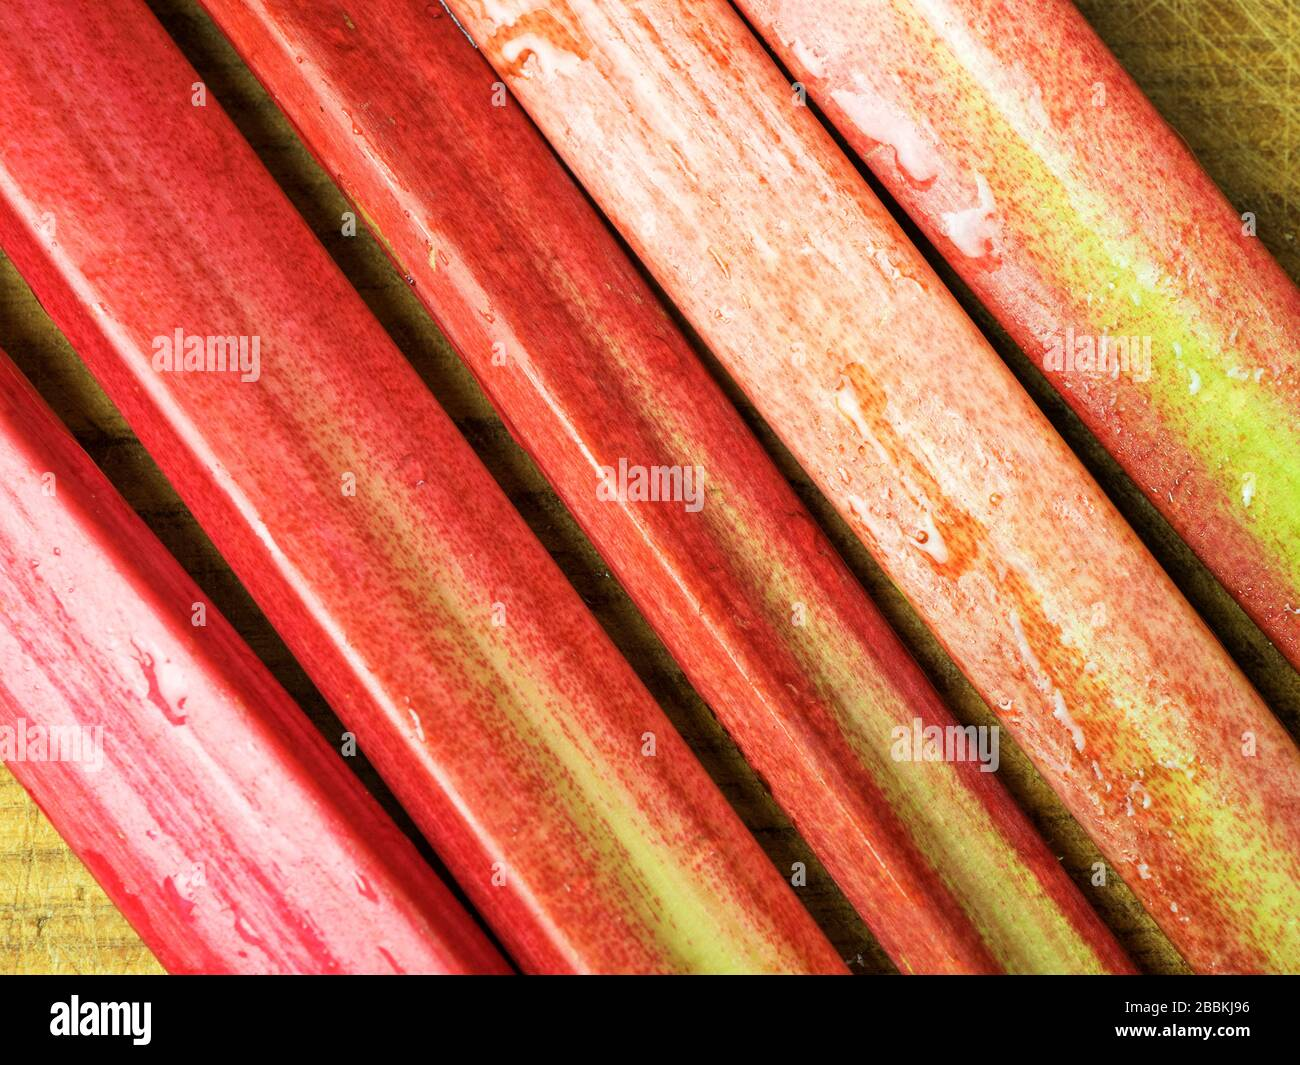 Fresh homegrown rhubarb stalks on a wooden chopping board Stock Photo